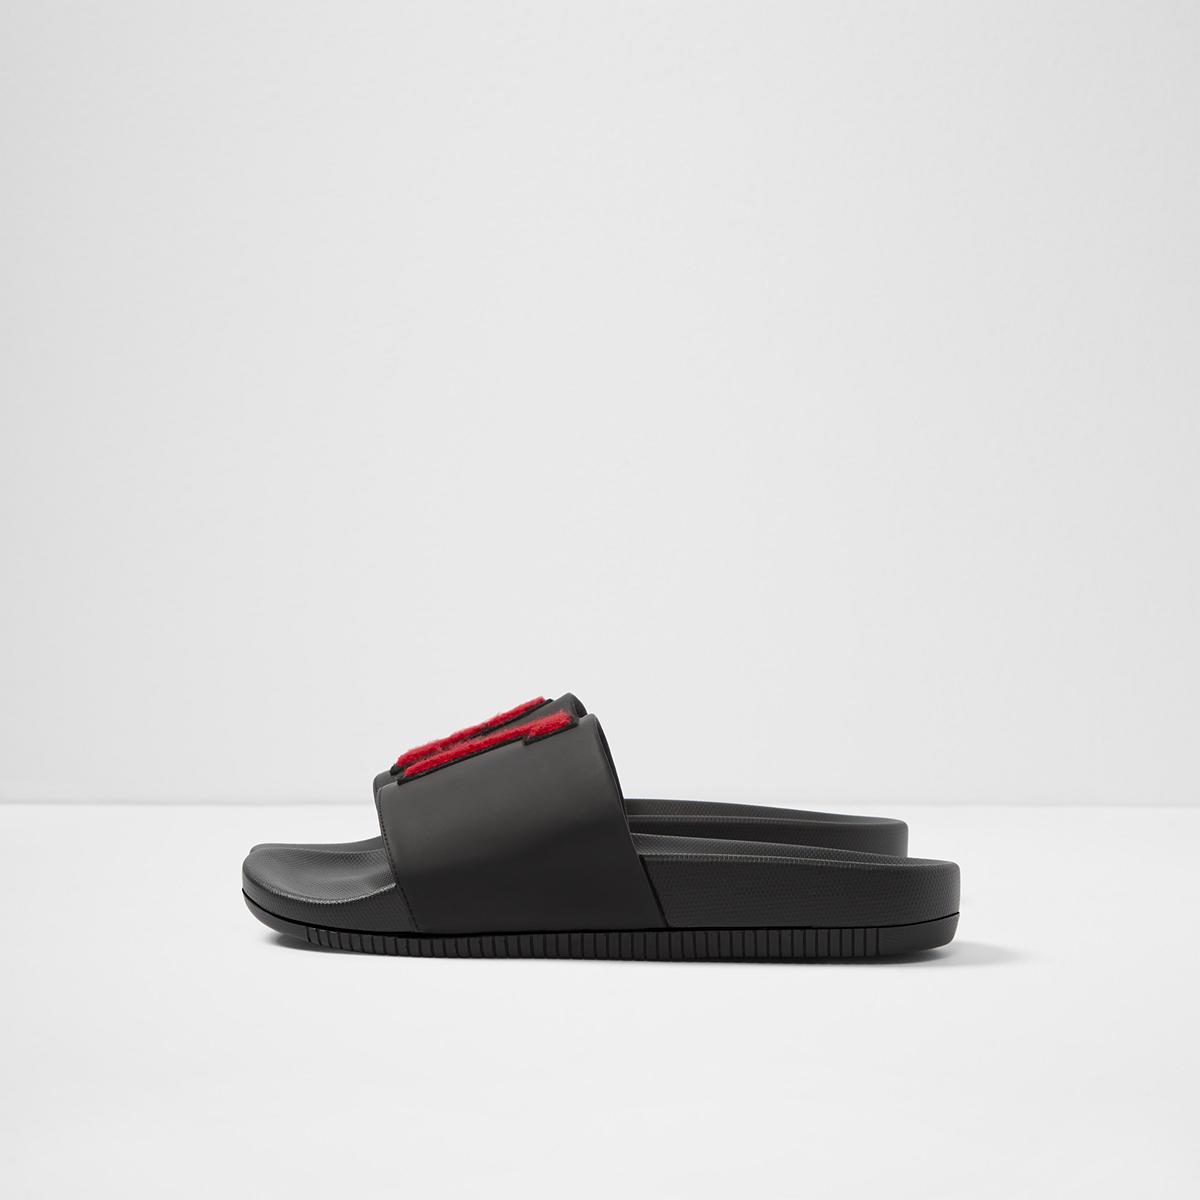 97ccd1bd519b Nayeli Black Men s Sandals